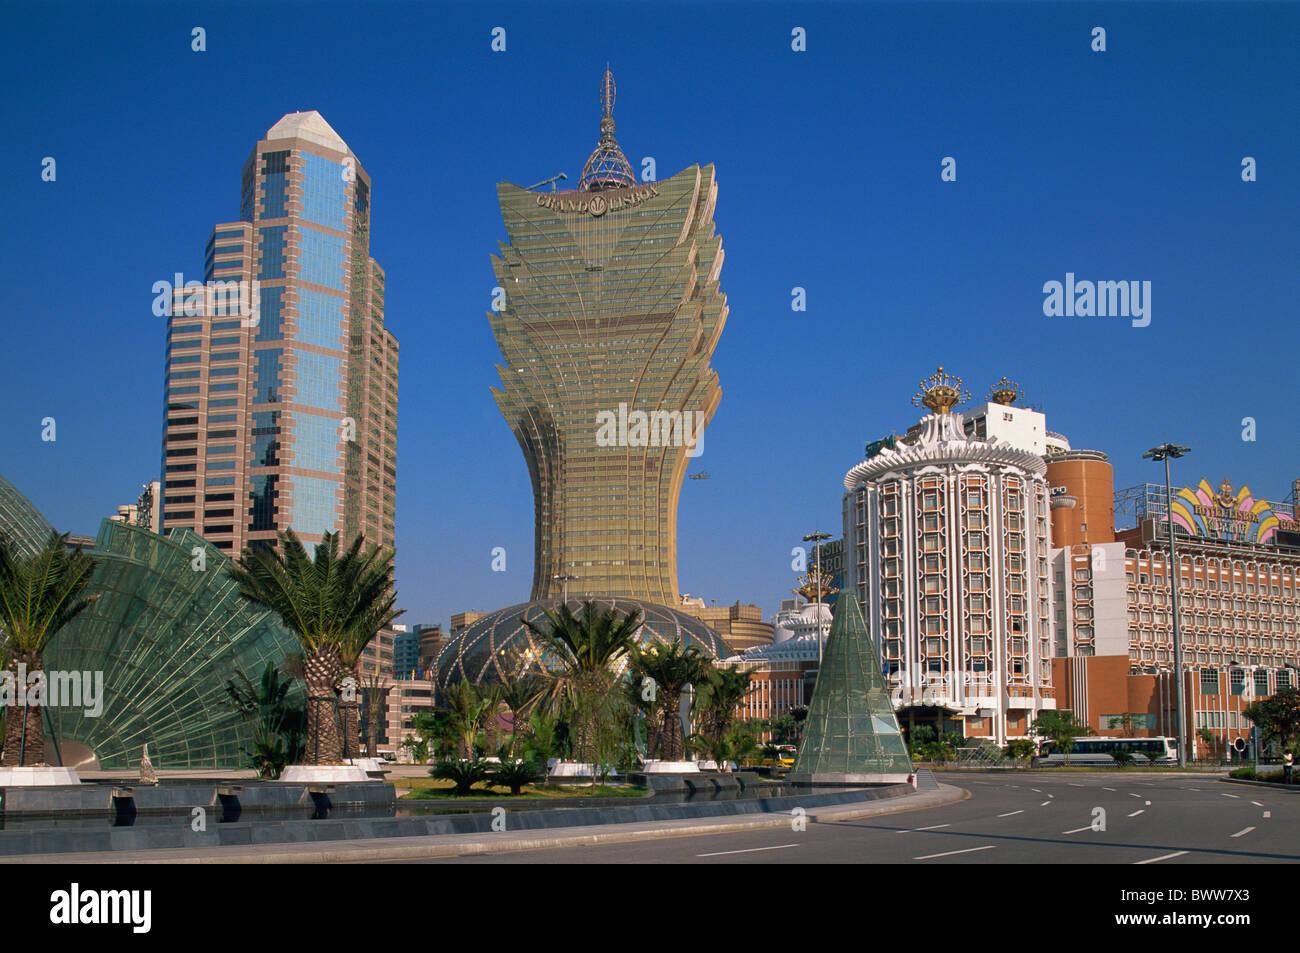 China city casino jazz sports casino